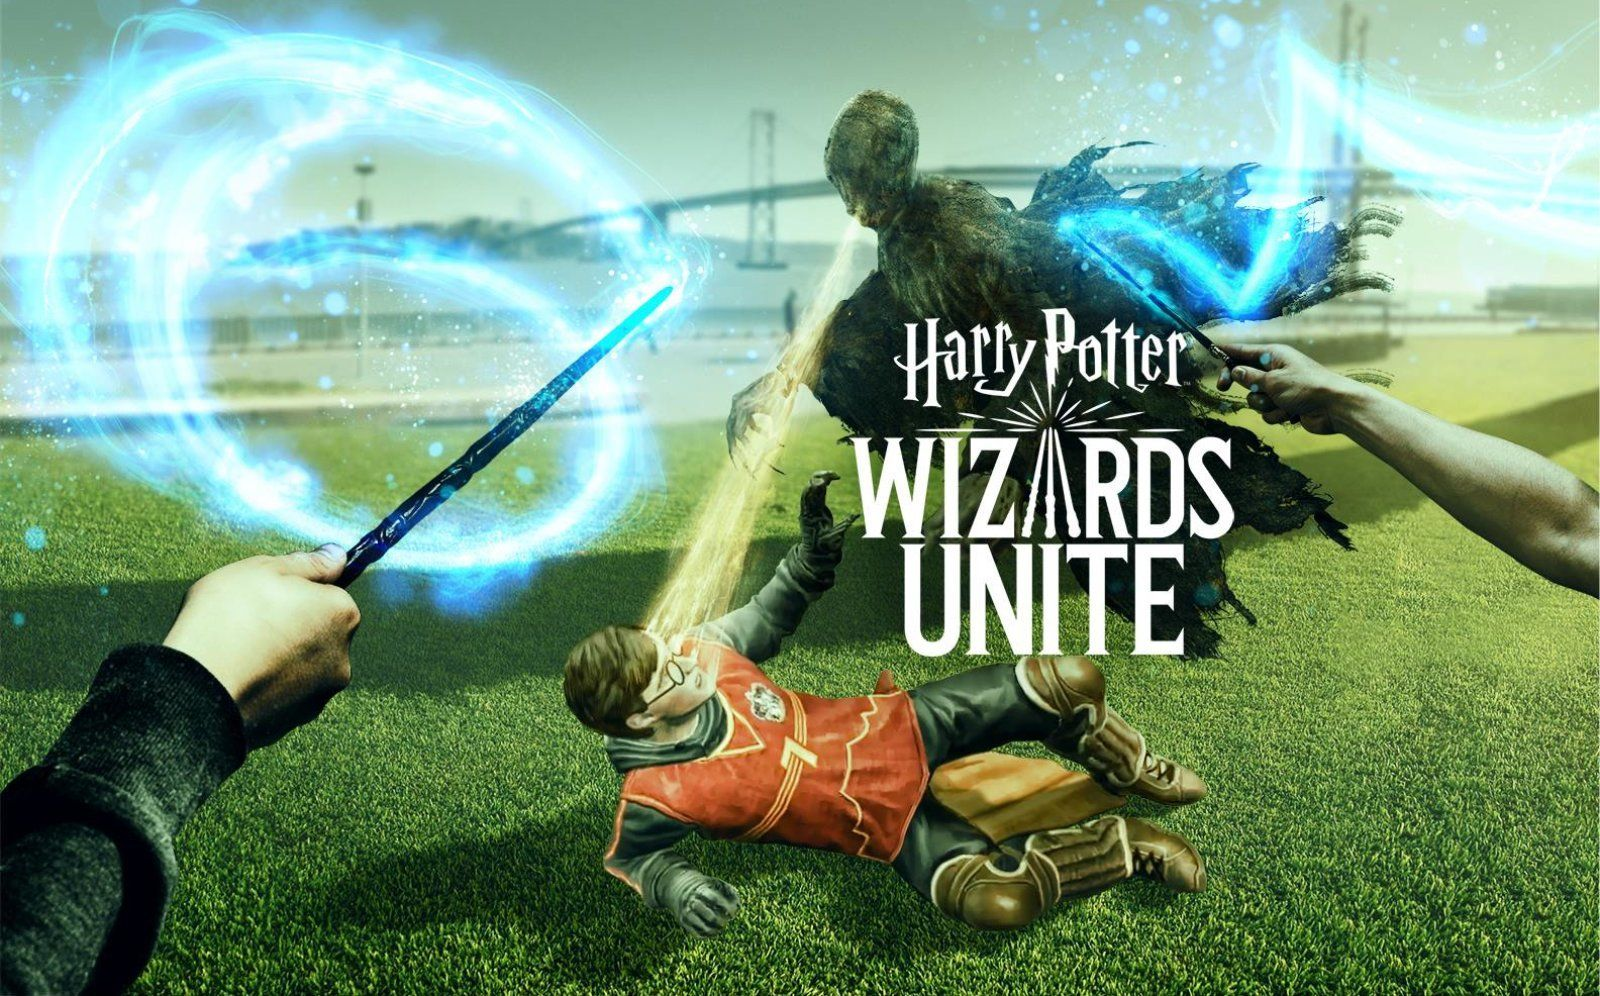 Wizard Unite Harry Potter Wizard Harry Potter Niantic